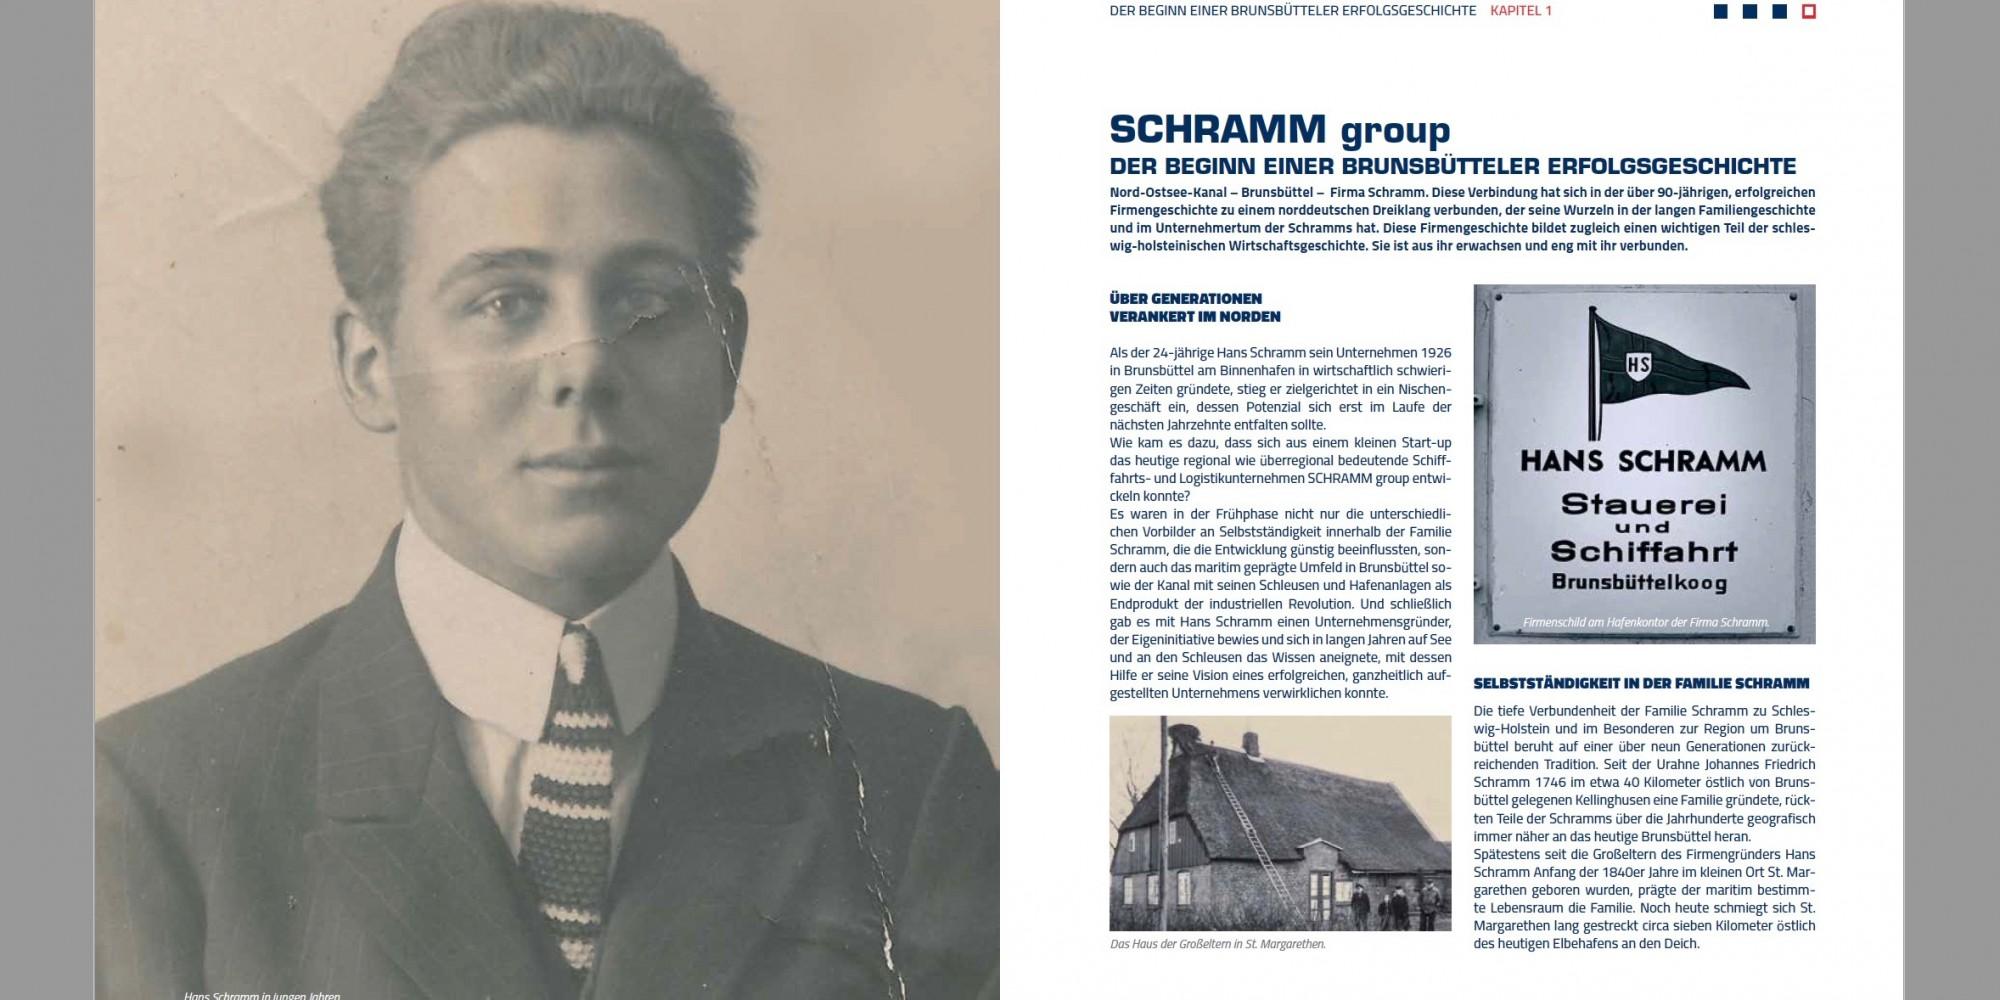 Firmengeschichten Hamburg_SCHRAMM group_Historiker Genossenschaft